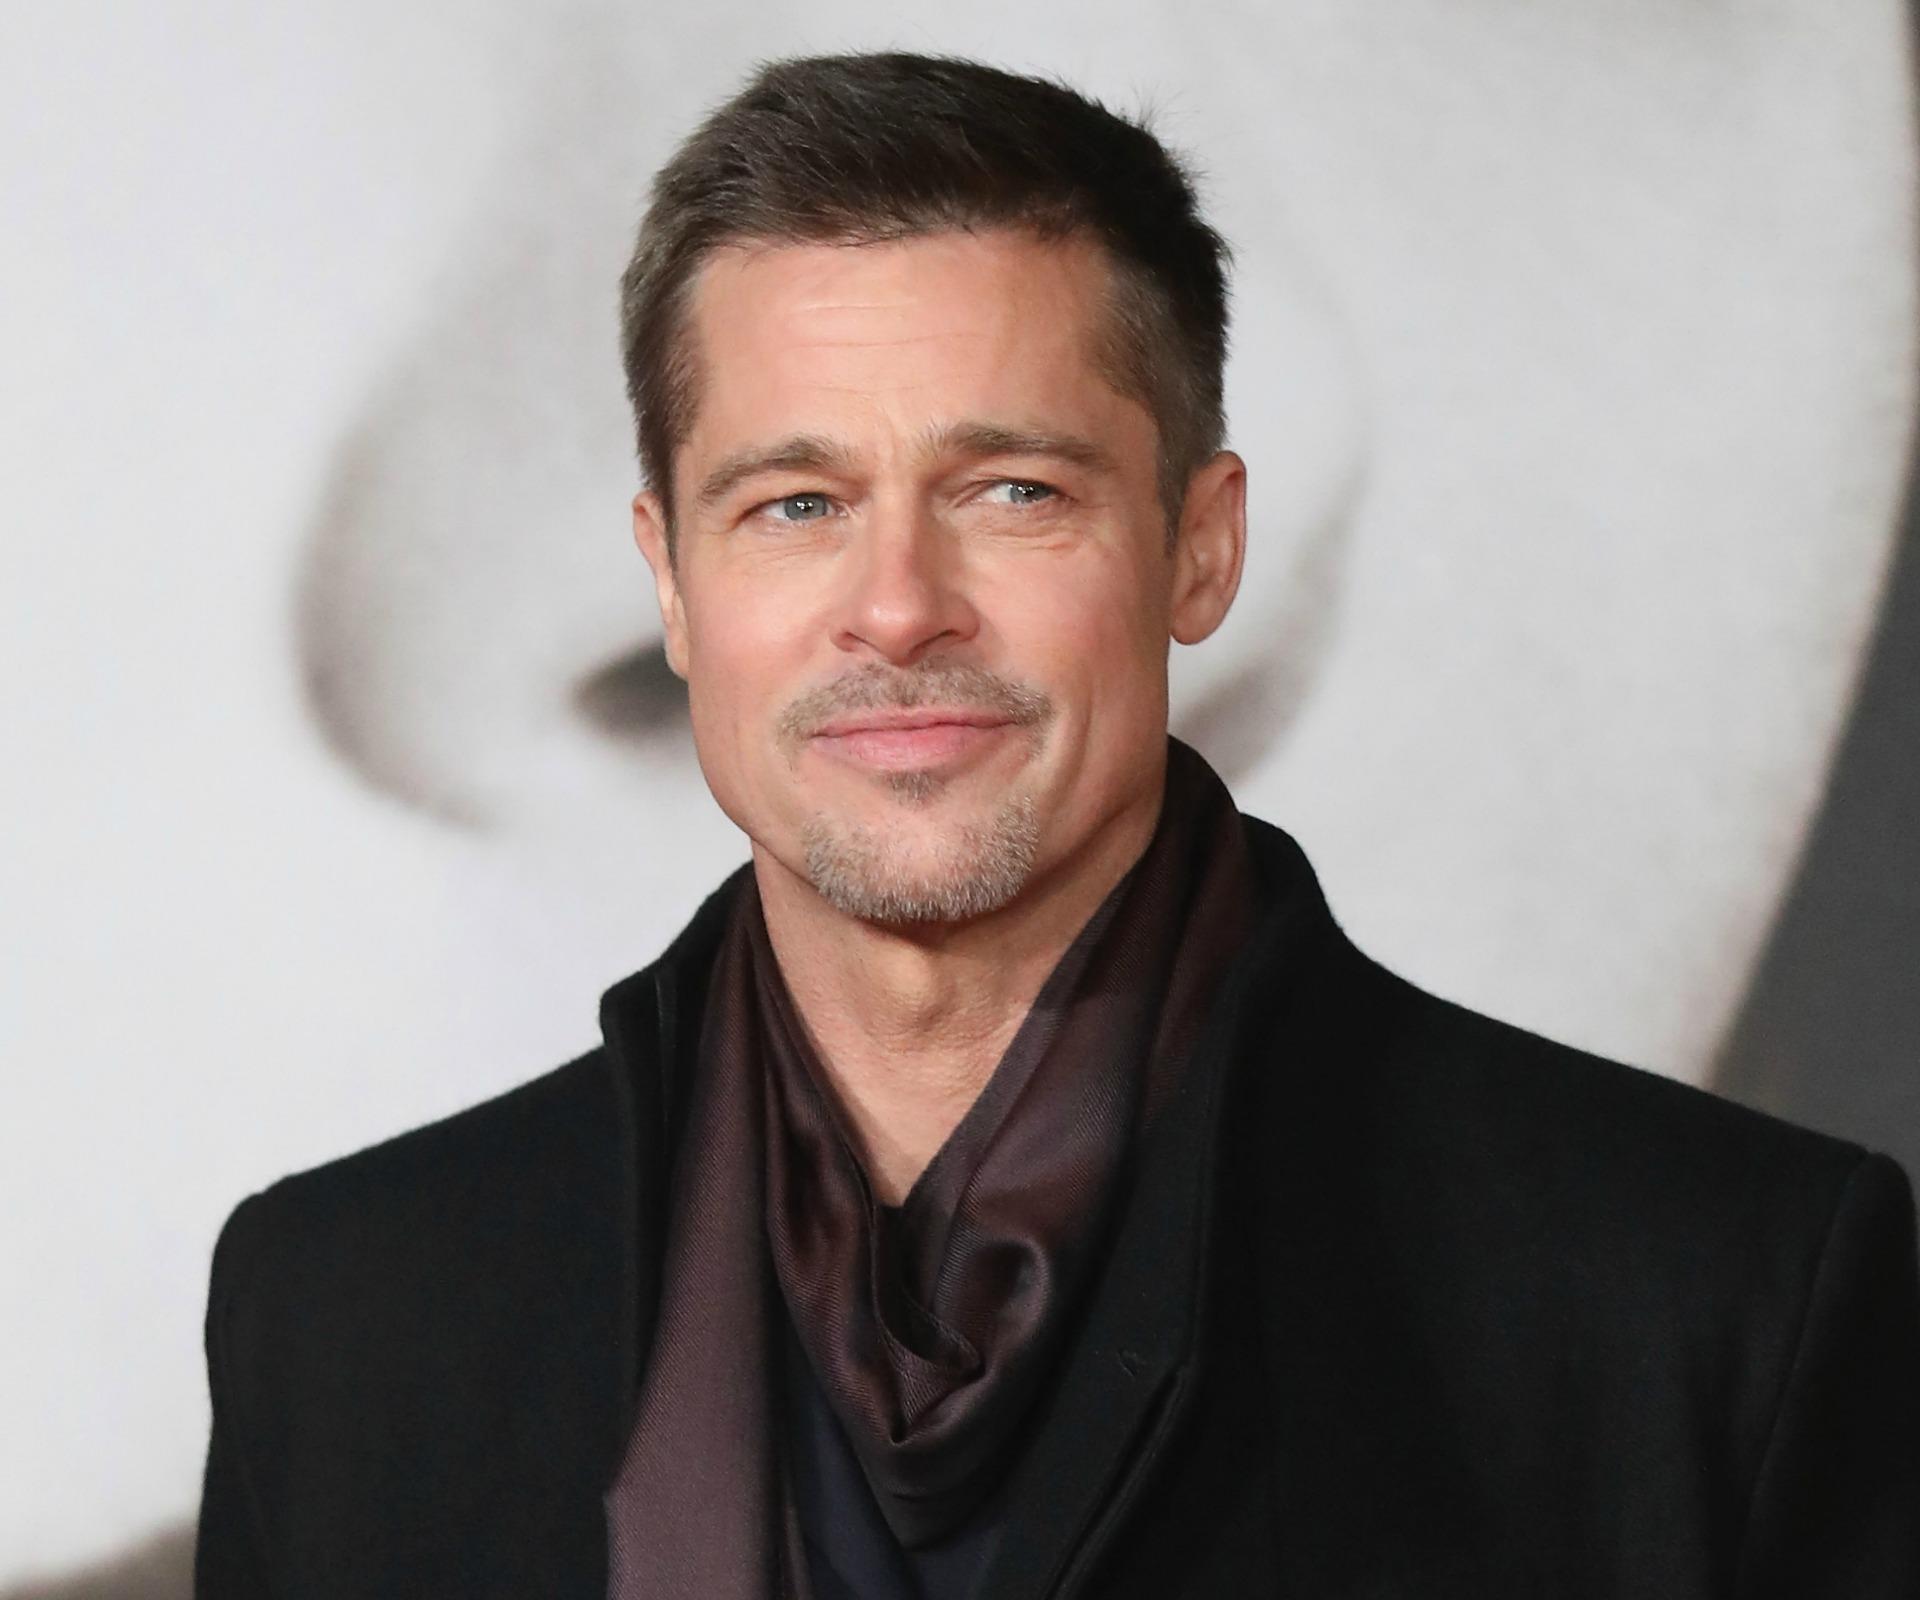 Did Brad Pitt secretly have a stint in a VIP rehab?